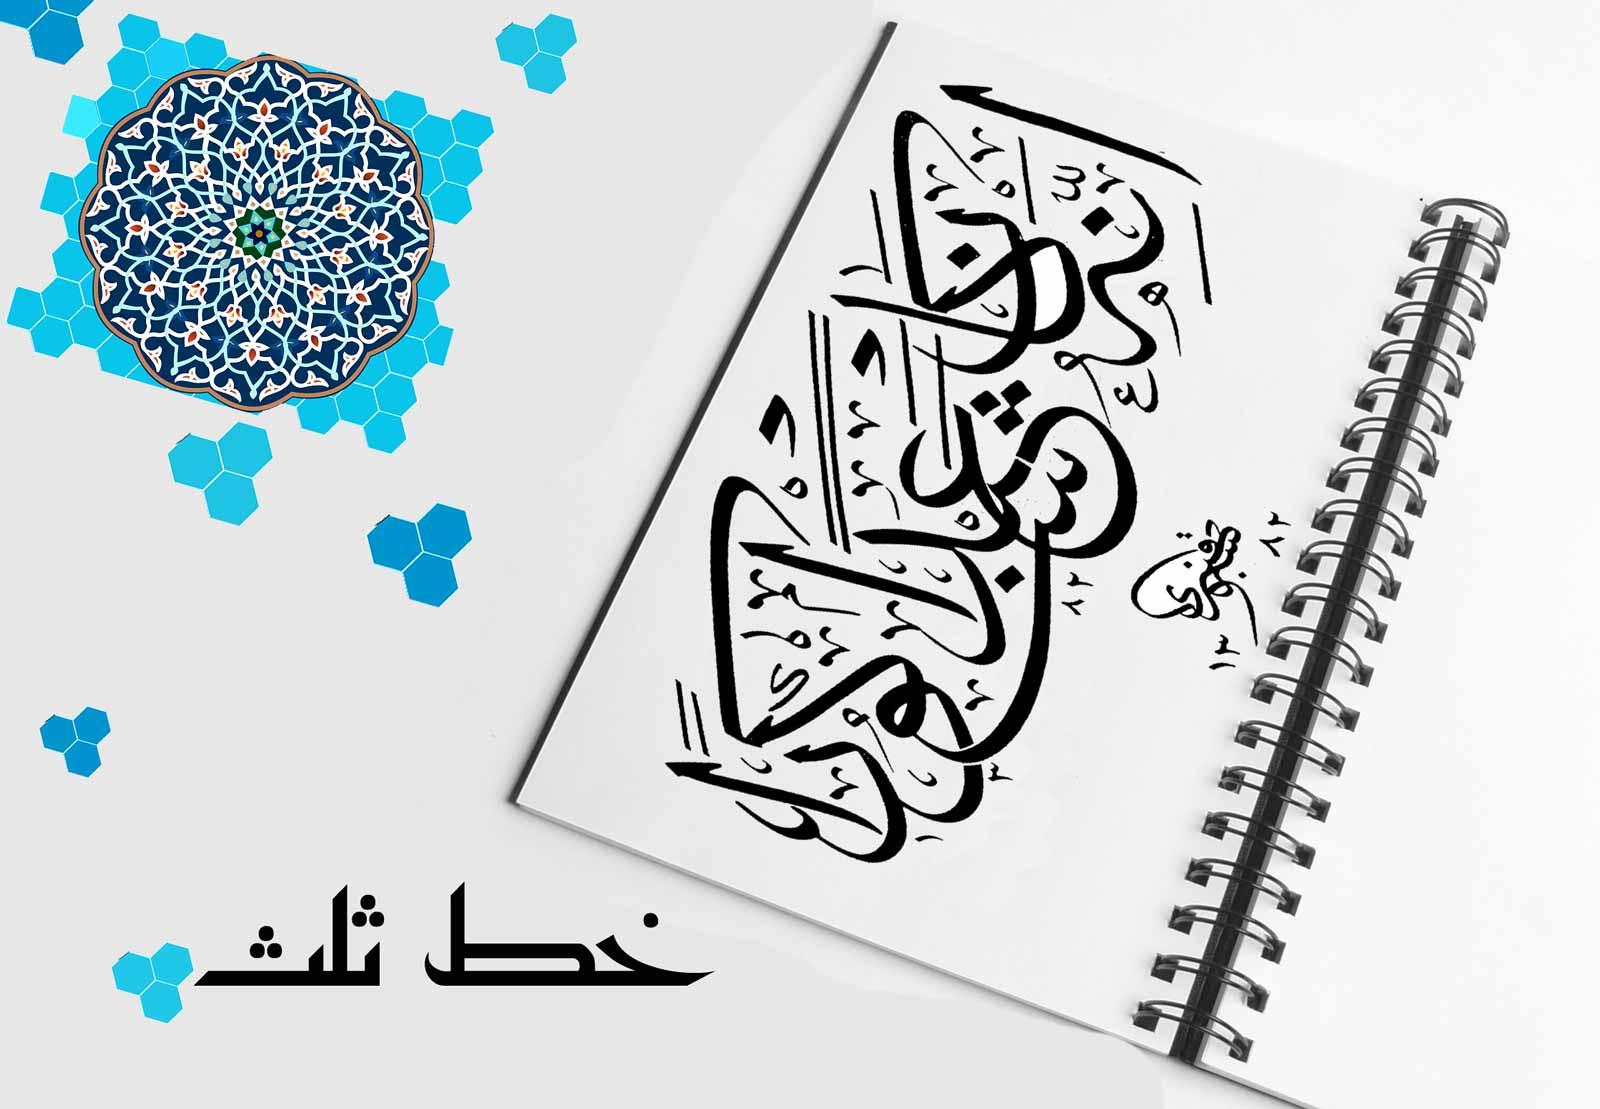 khoshnevisi 4ho05s - انواع خوشنویسی و سیستم های نوشتاری جهان